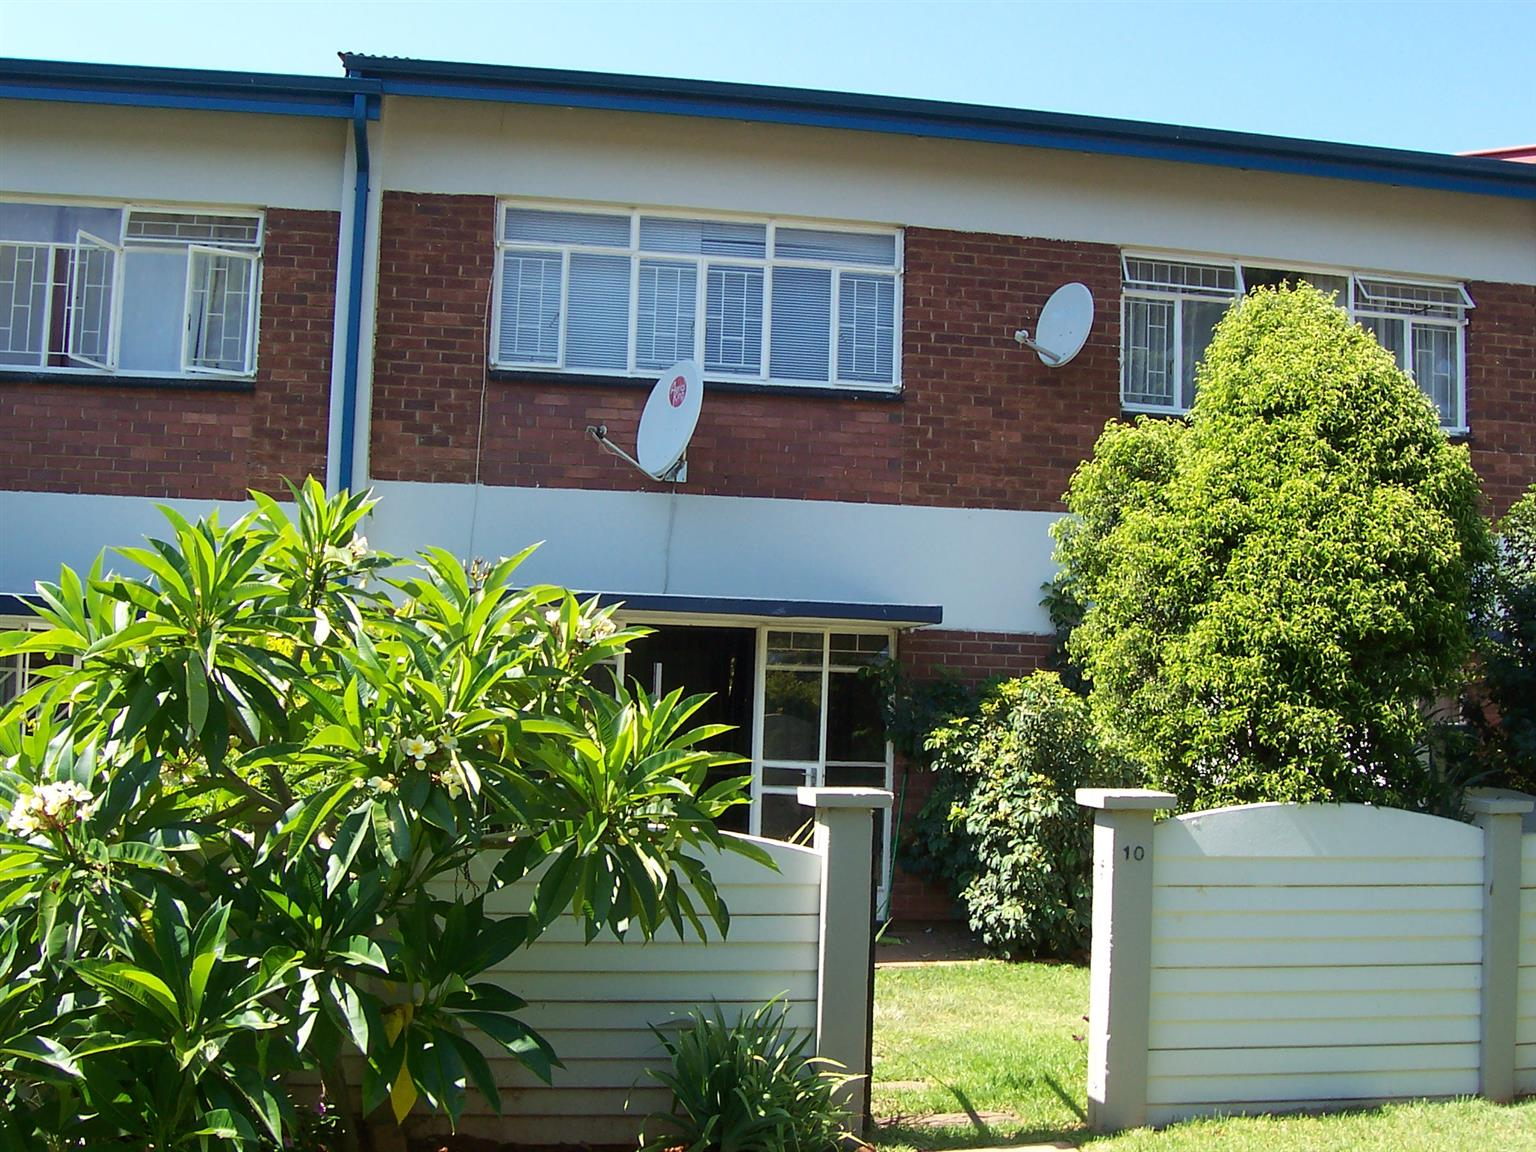 TE HUUR Duplex Meenthuis in Riviera, Pretoria